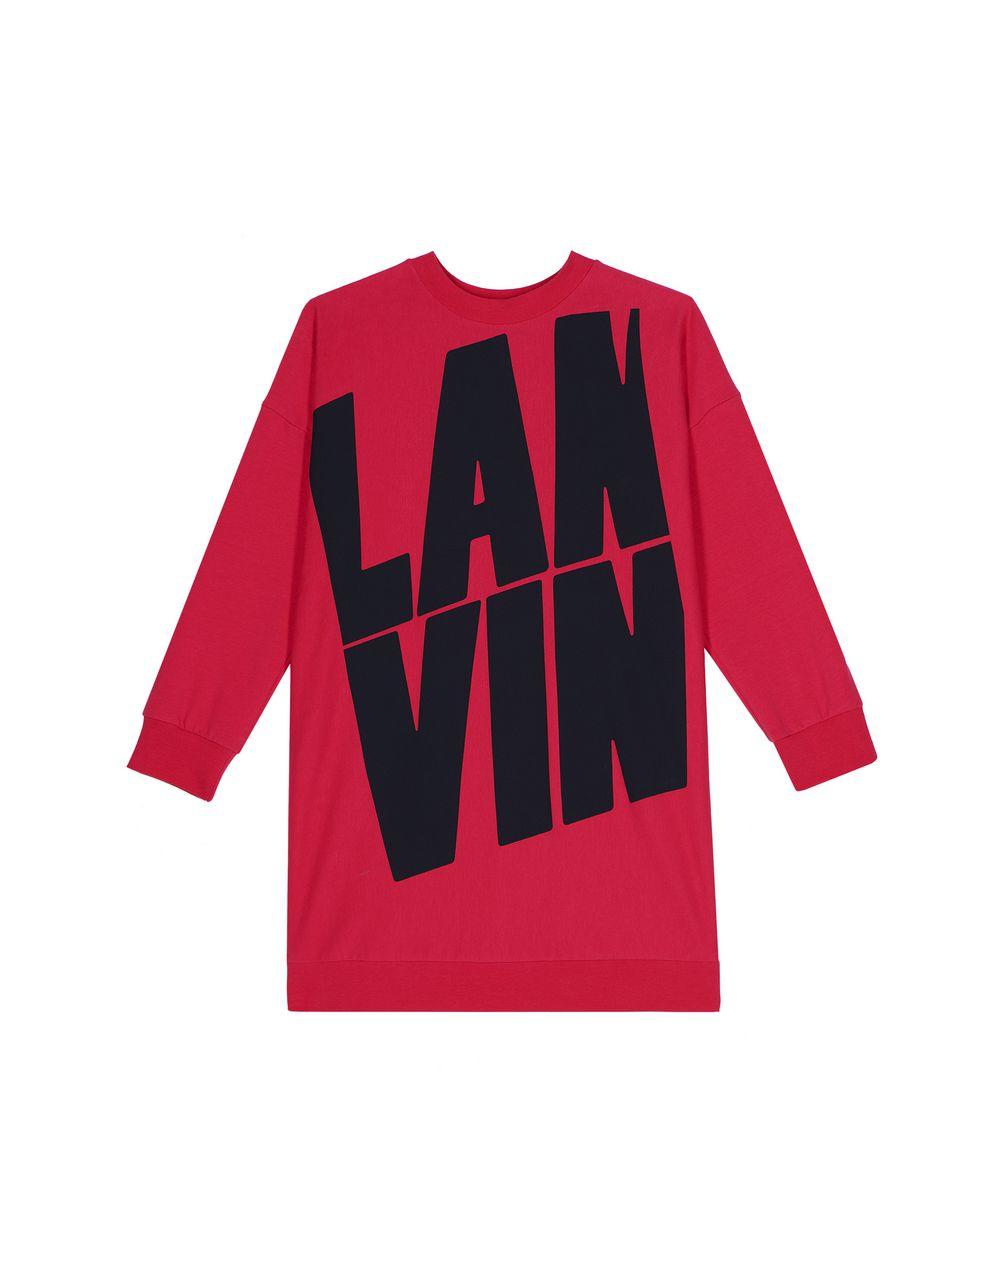 FUCHSIA LANVIN LOGO DRESS  - Lanvin